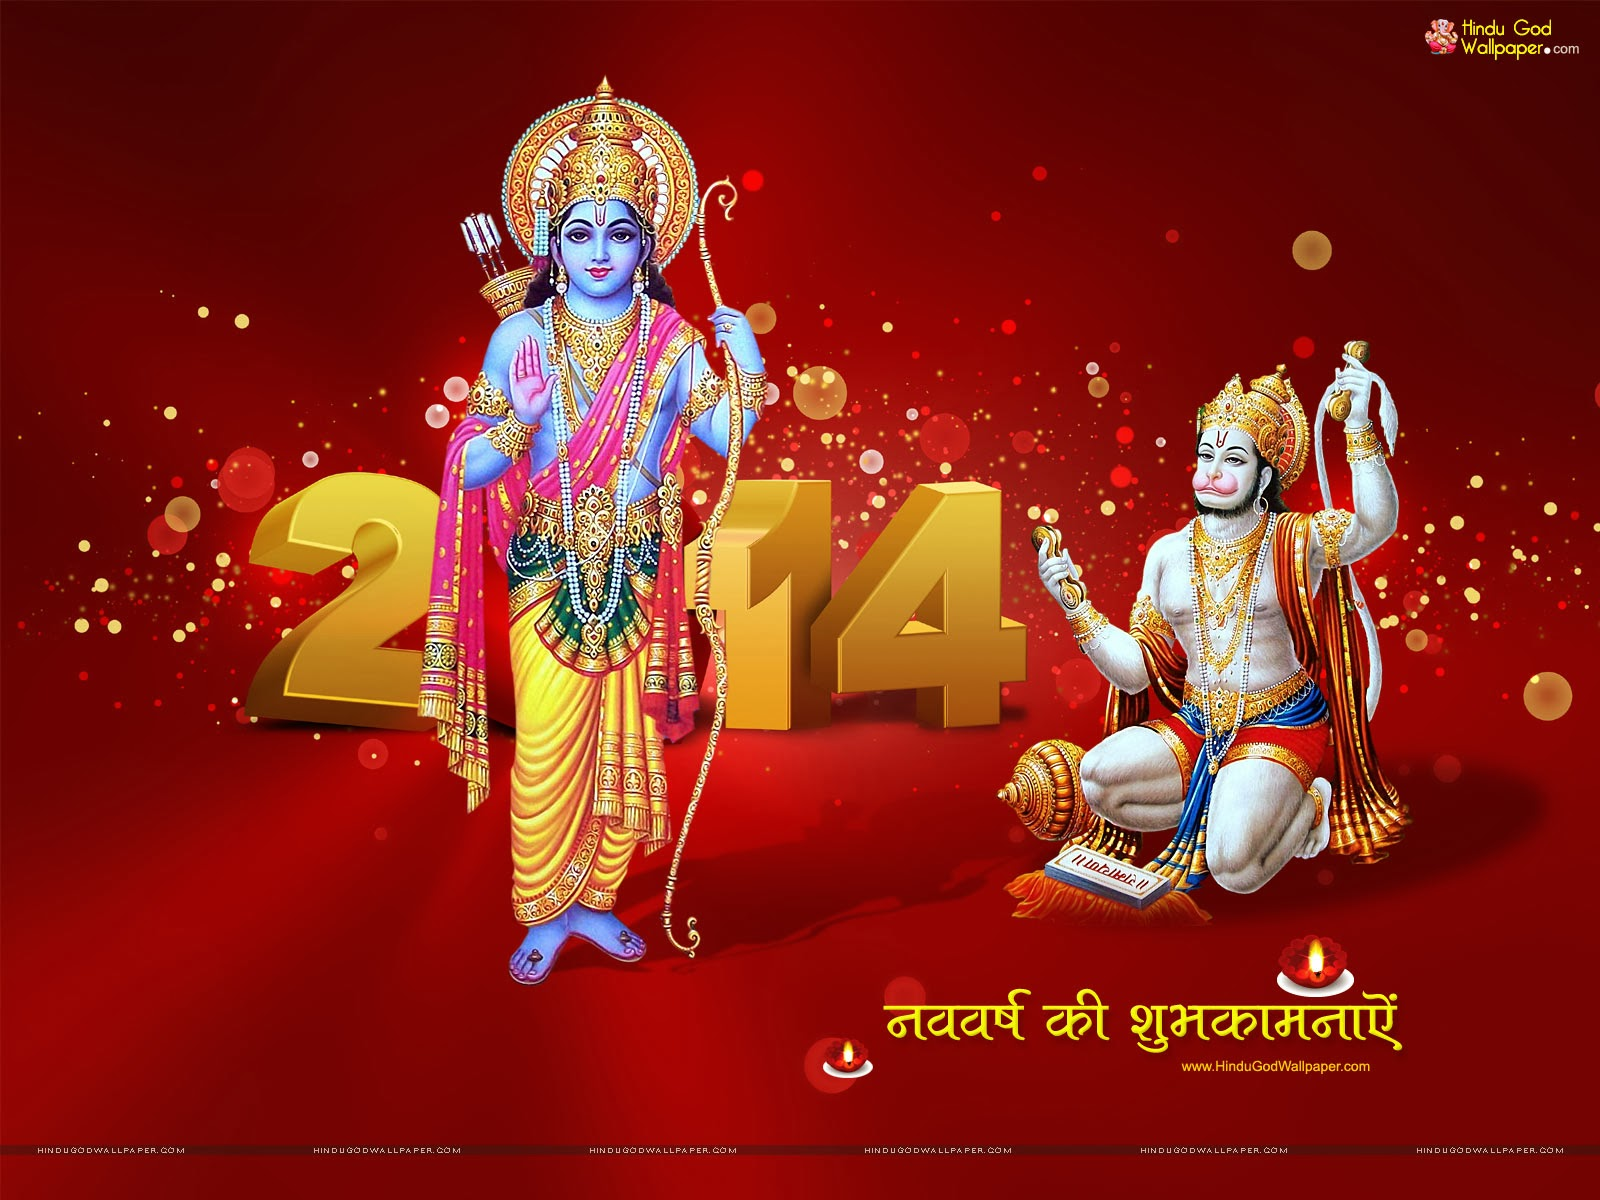 hindu god picture